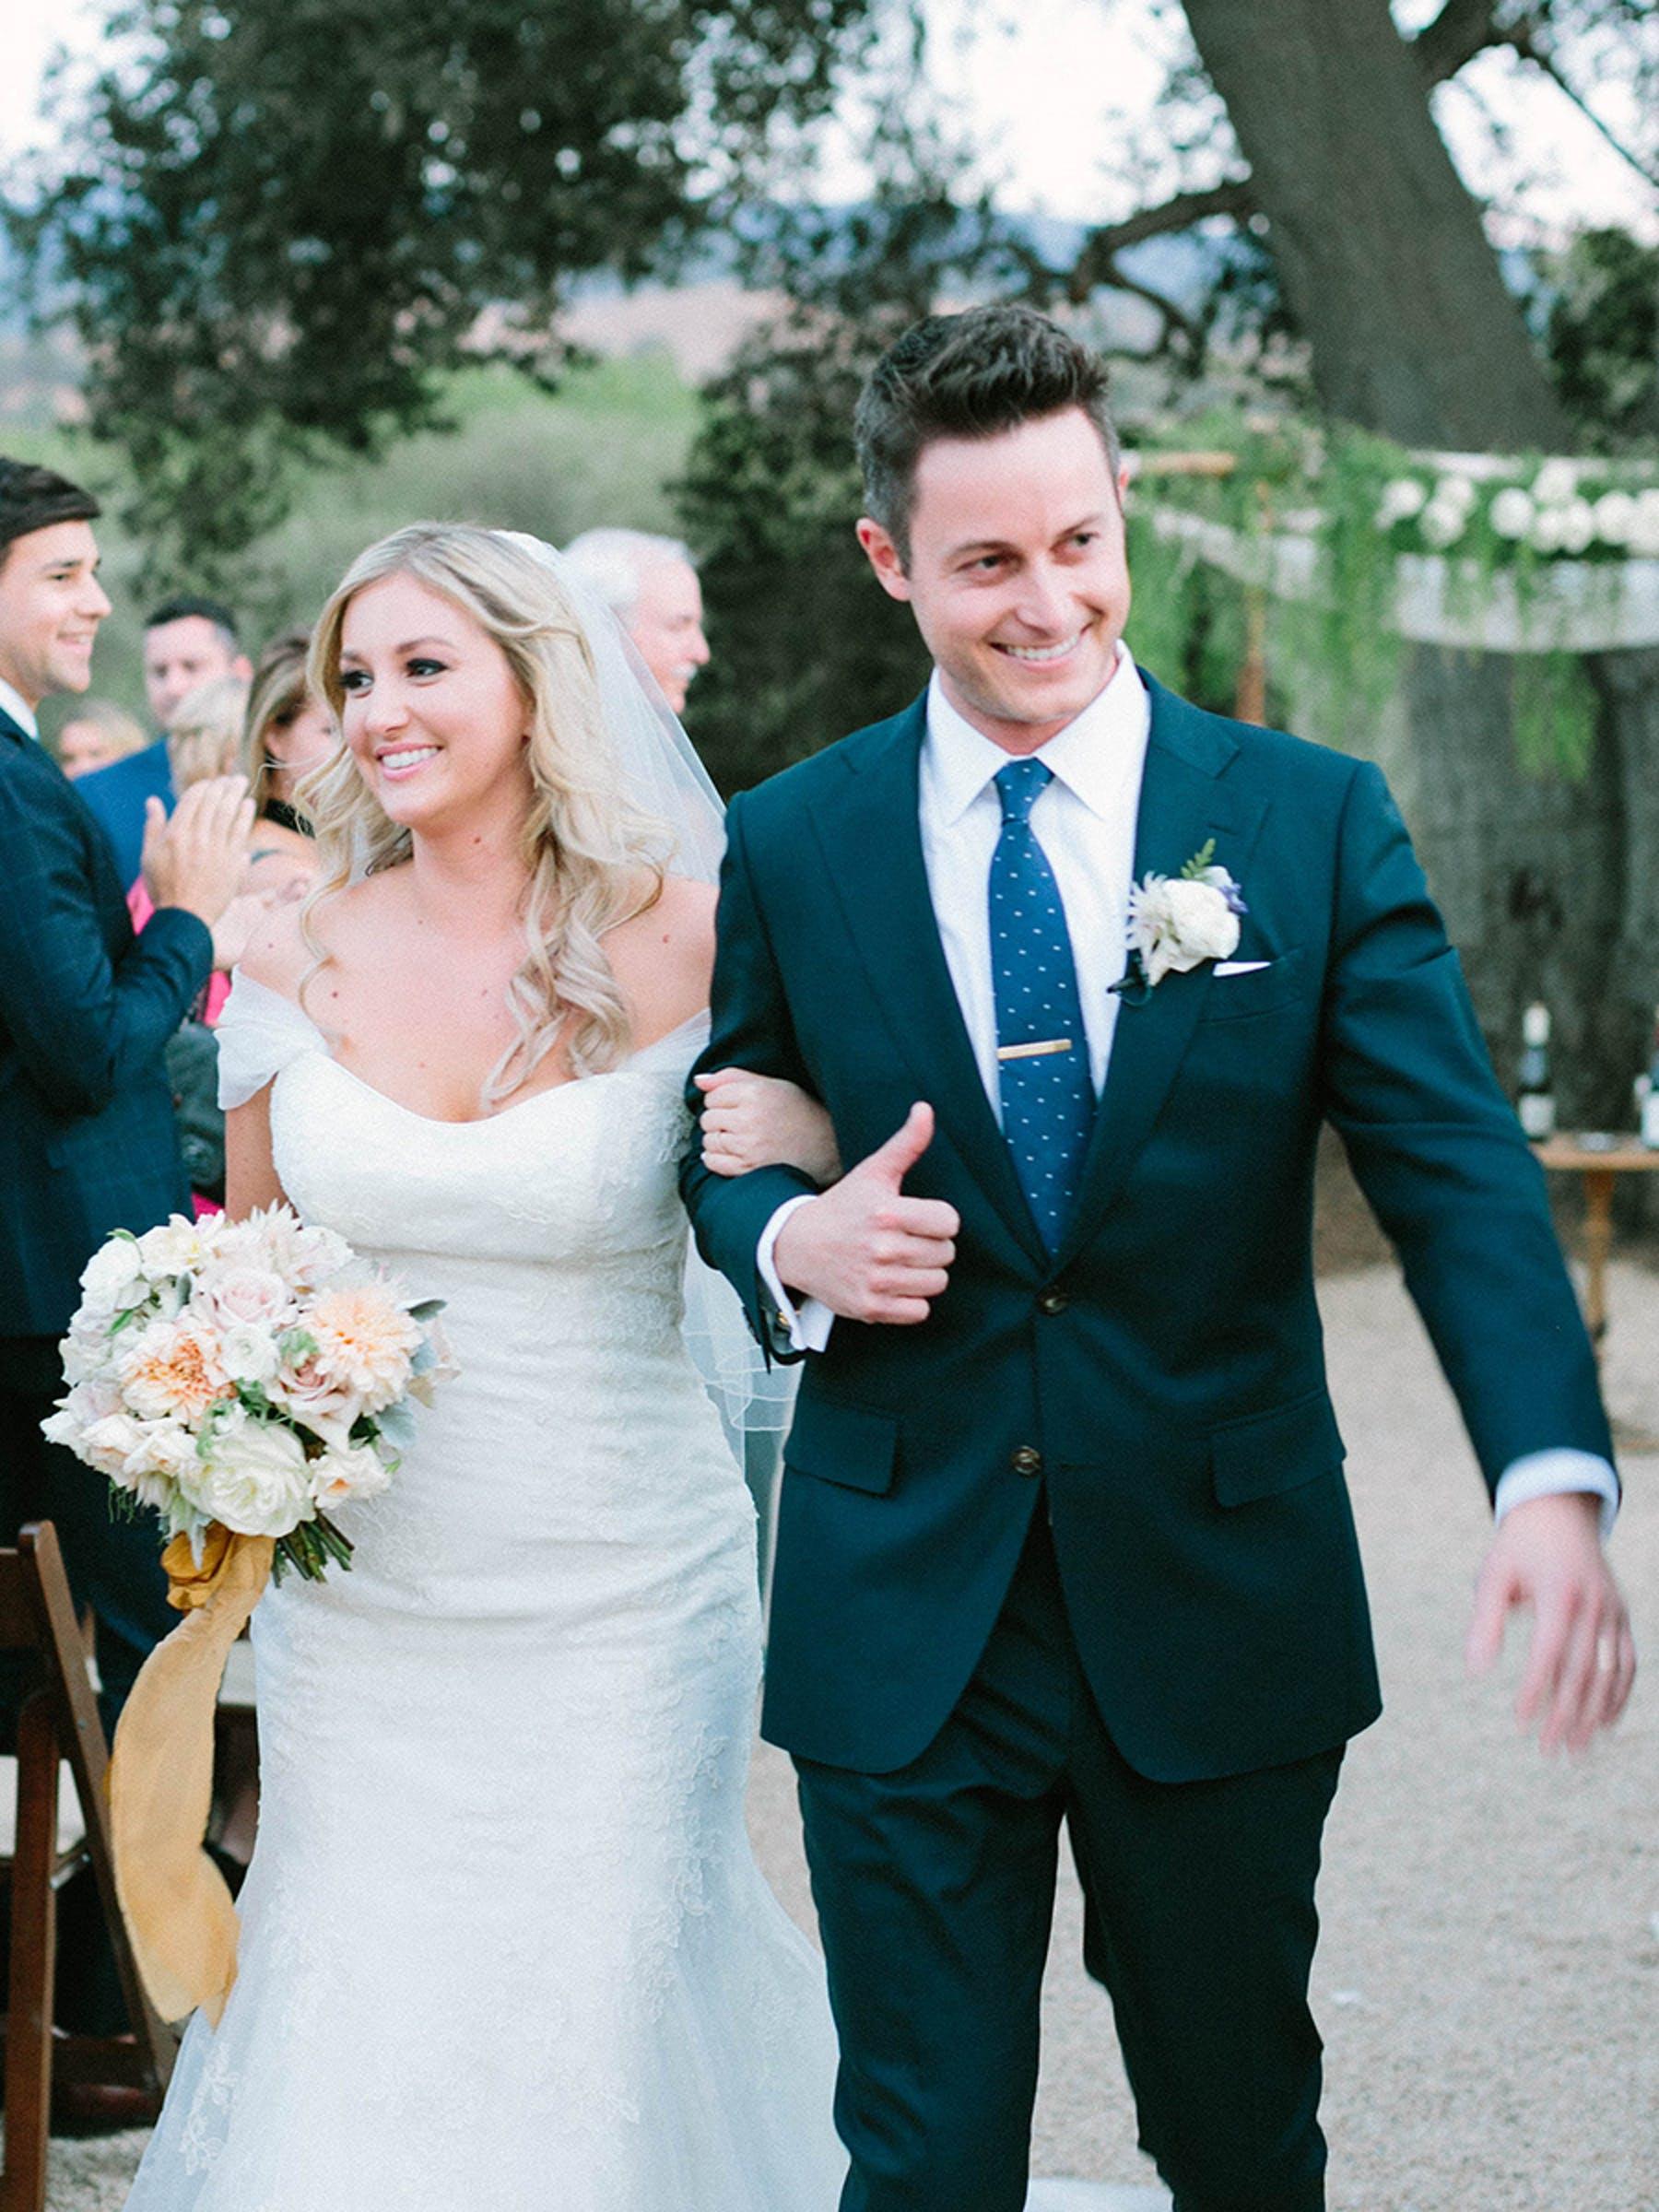 www.santabarbarawedding.com | Sunstone Winery | Luna de Mare | Esoteric Events | Bride and Groom | Ceremony